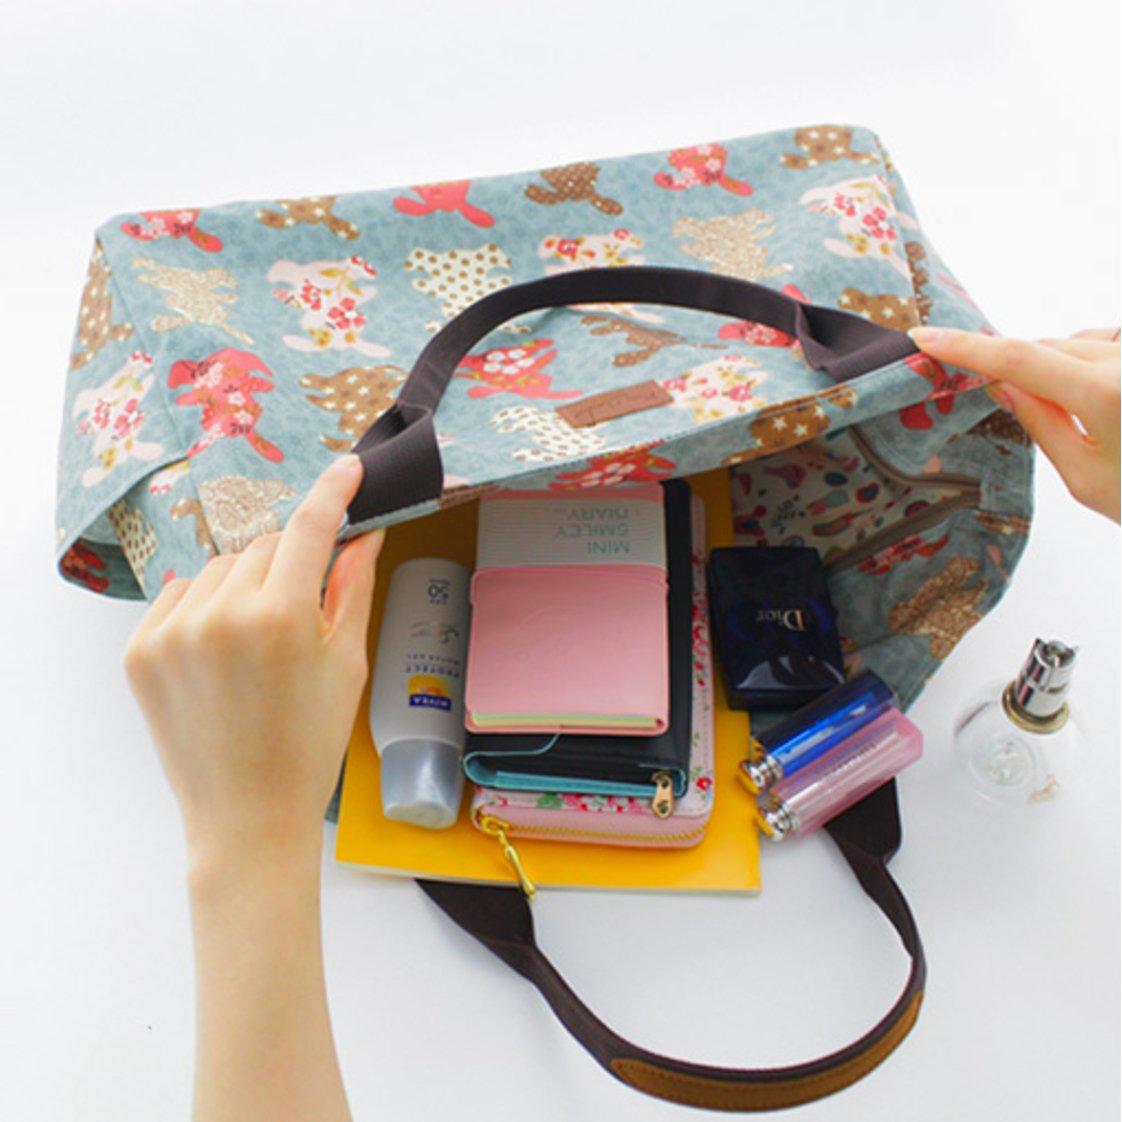 Bany Bany - Pink Rose Garden Womens Day-Bag Flower Illustration Pattern Duffel Boston Travel Bag Series